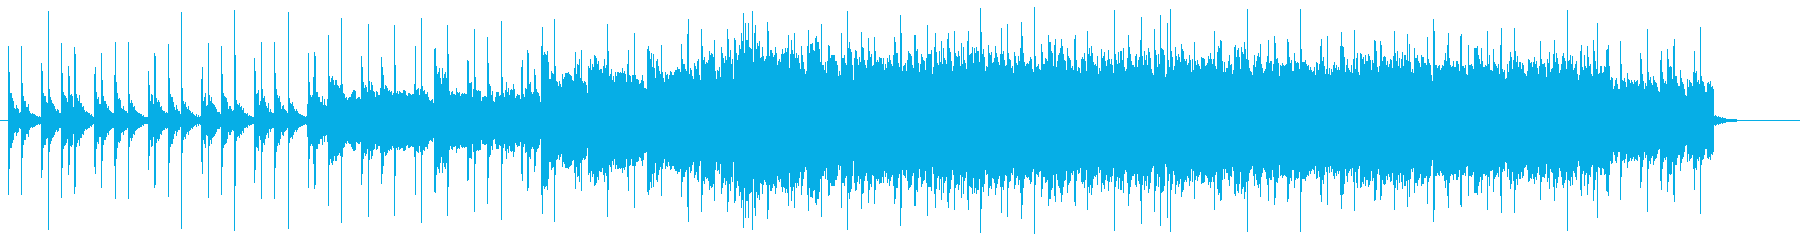 CM向けロックアンセム シンガロング無版の再生済みの波形